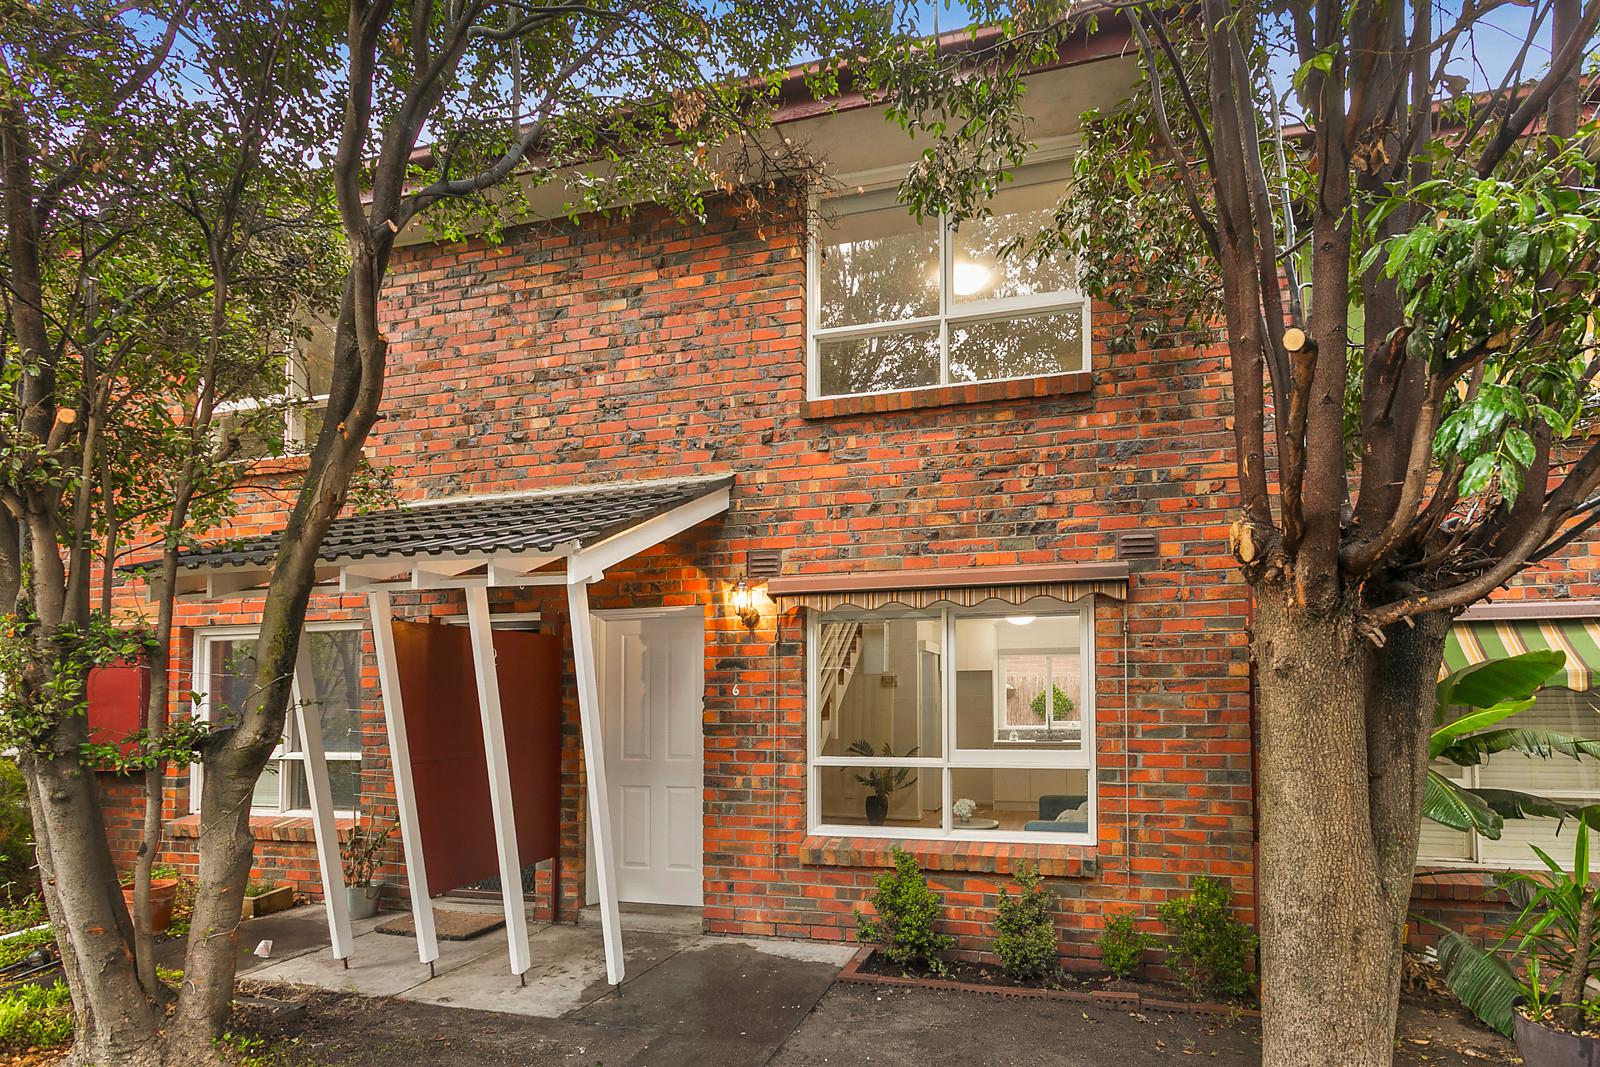 6/11 George Street, Reservoir, VIC, 3073 image 1